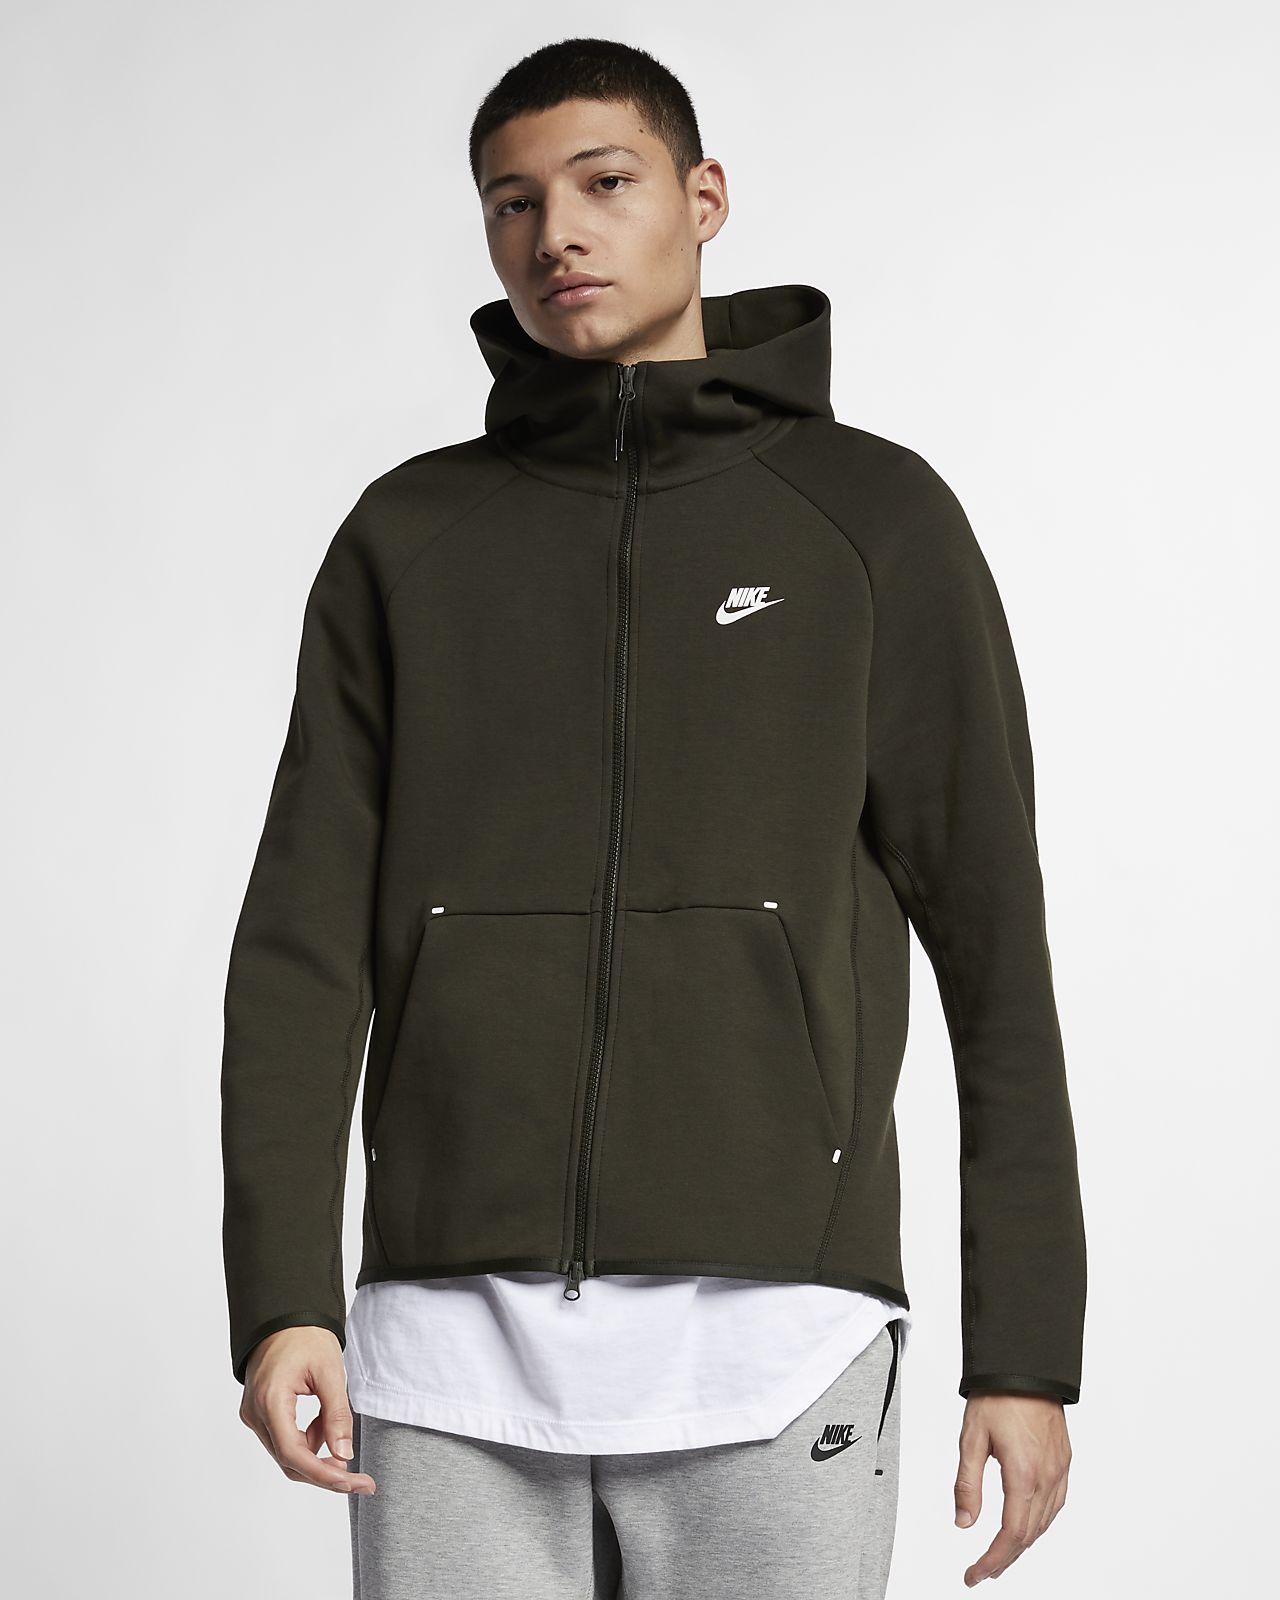 86c1a24b1ab2 Nike Sportswear Tech Fleece Men s Full-Zip Hoodie. Nike.com BE